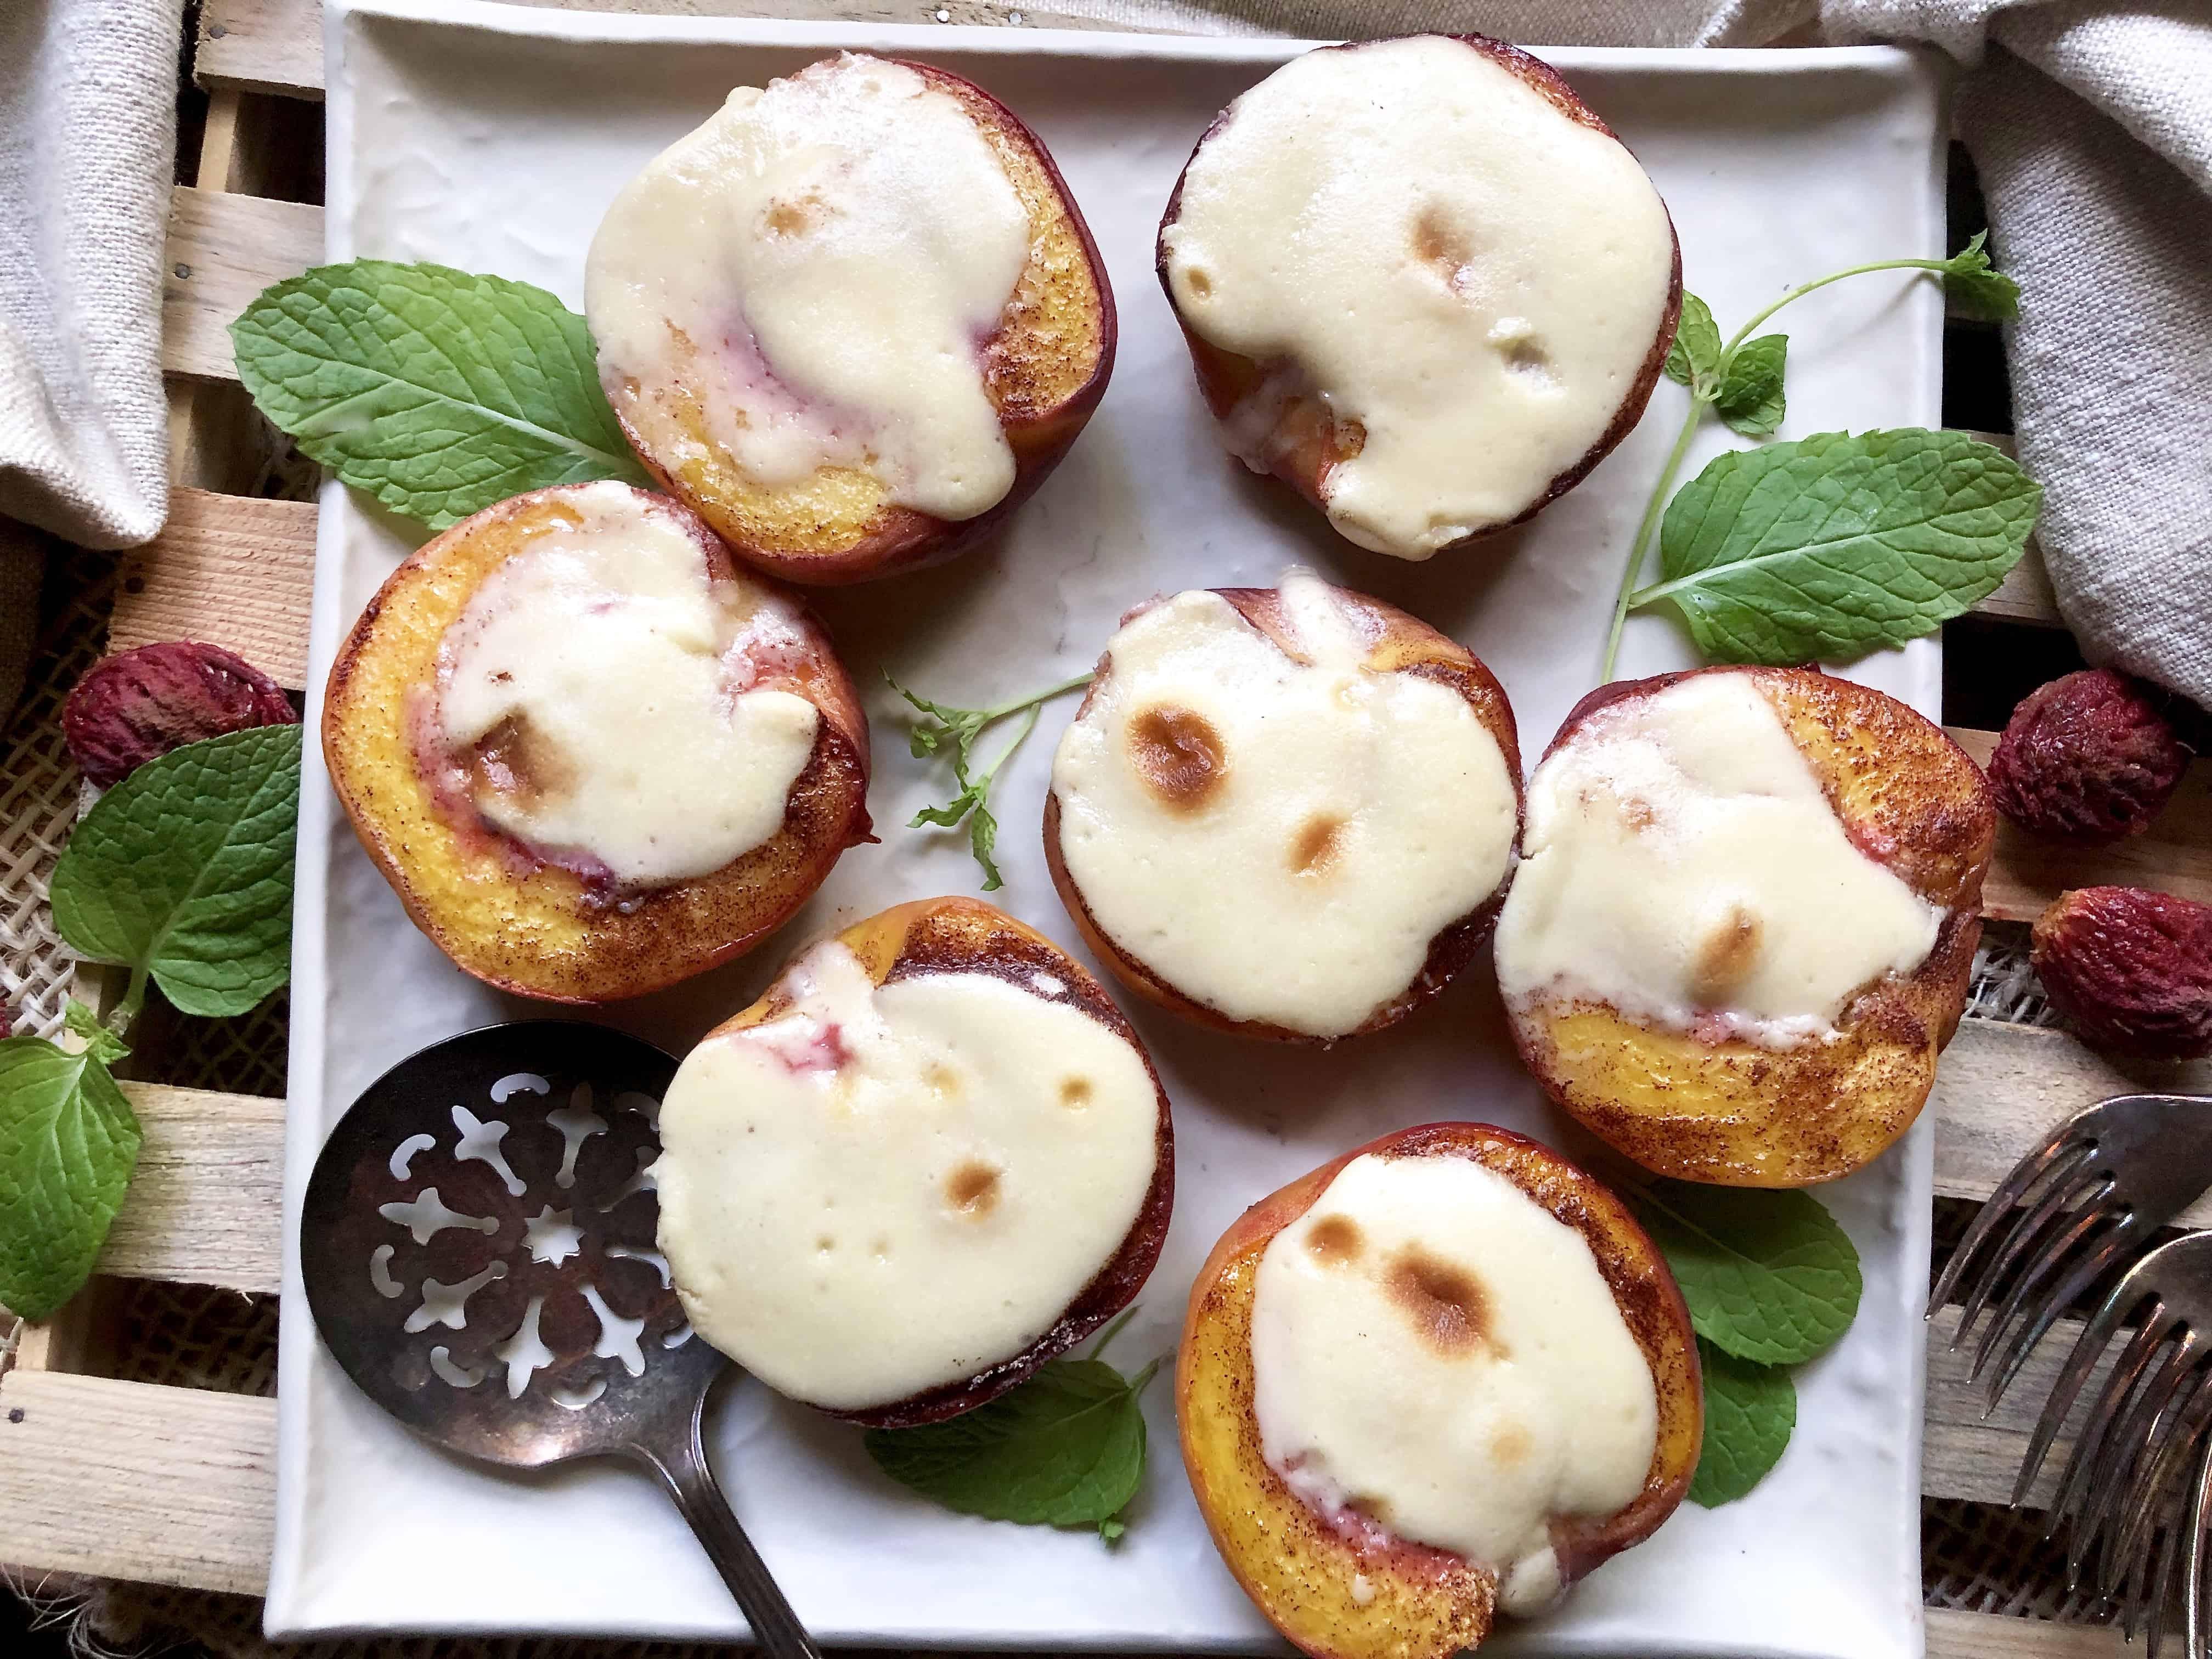 cheesecake-stuffed peach halves